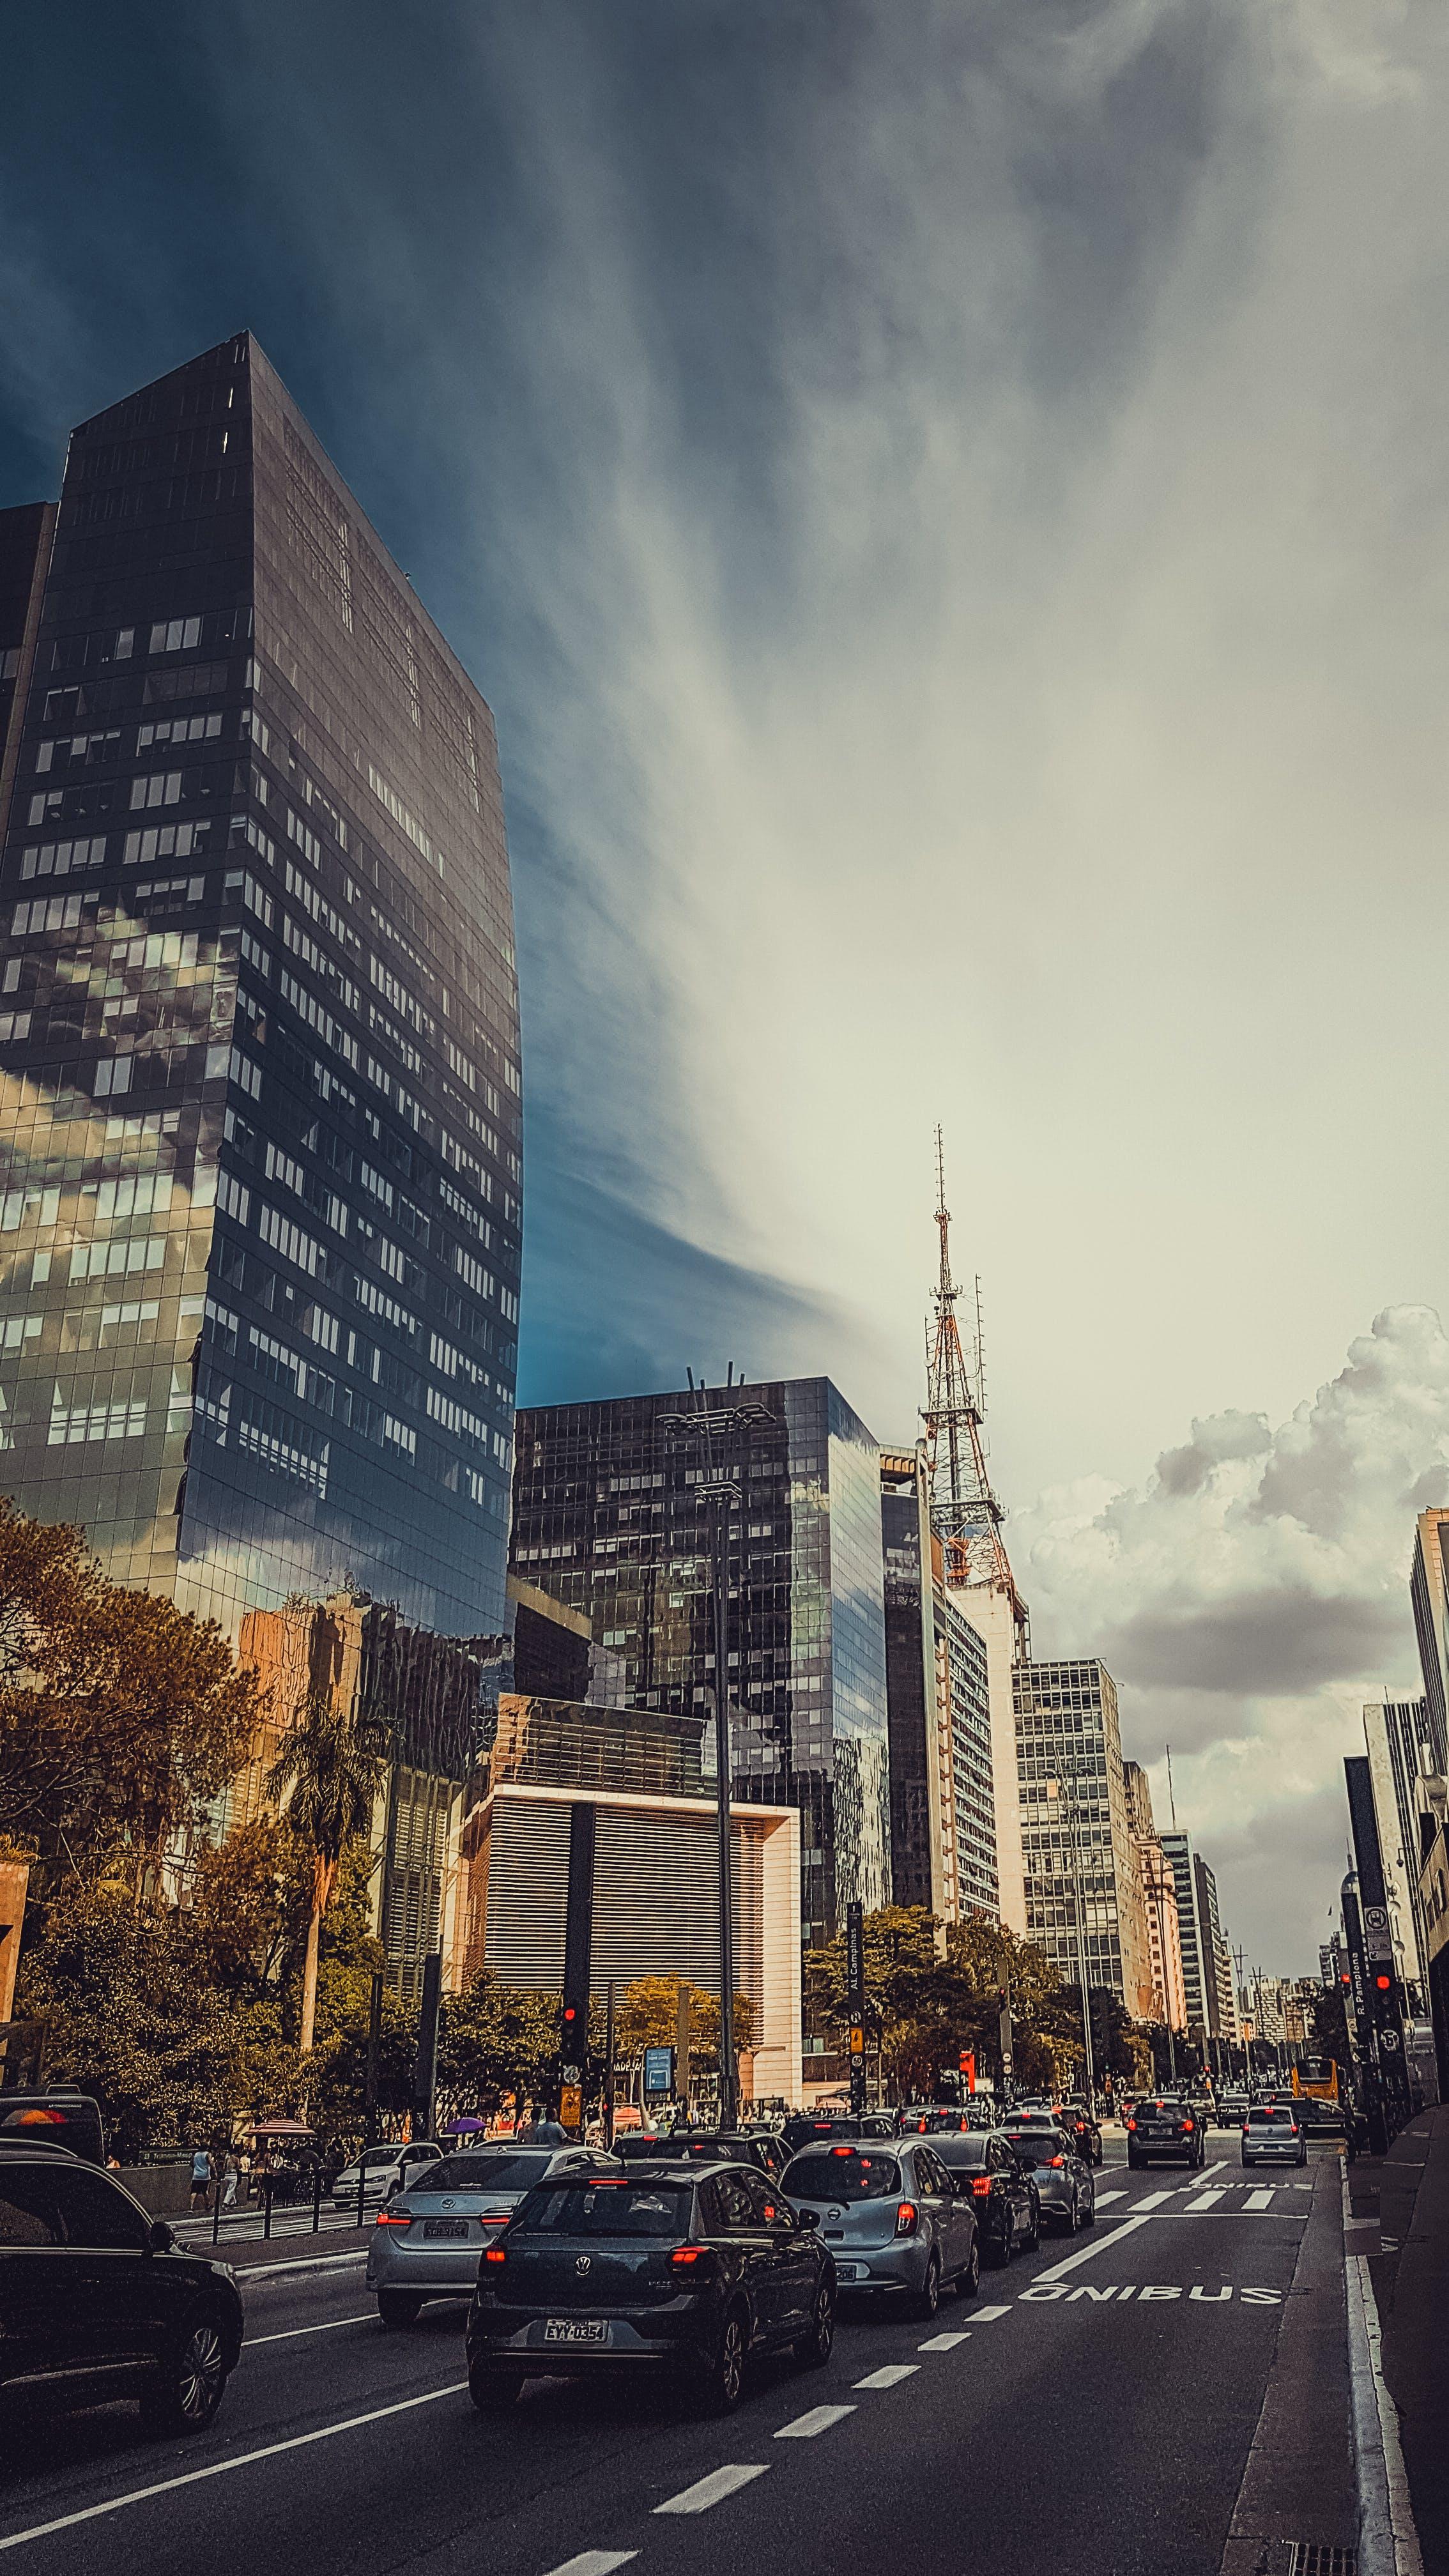 blue sky, cars, city